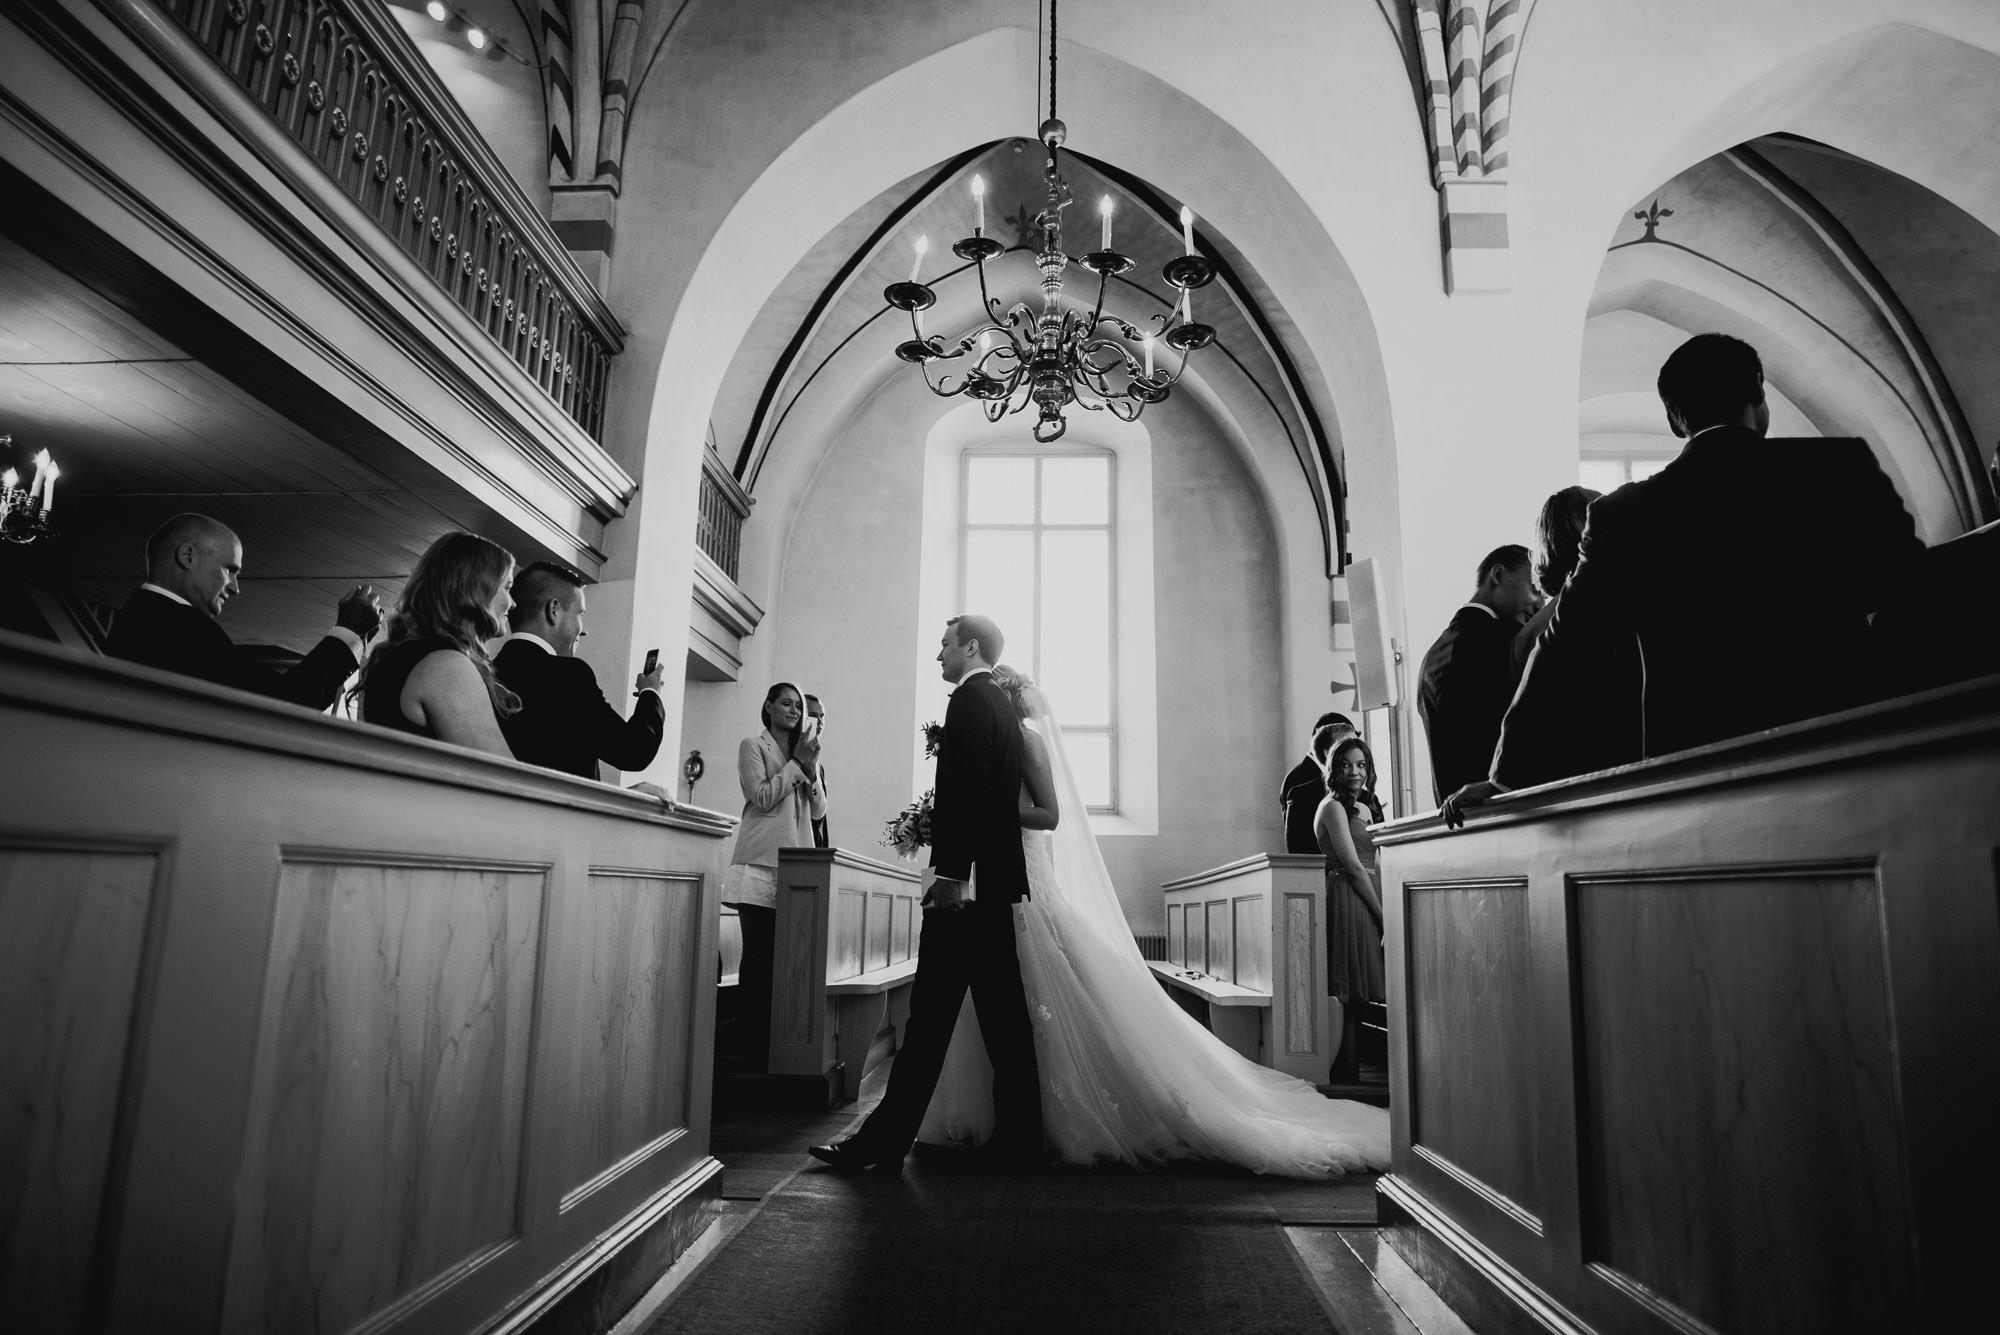 rabbit_visuals_haavideo_wedding_videography_el-008.jpg